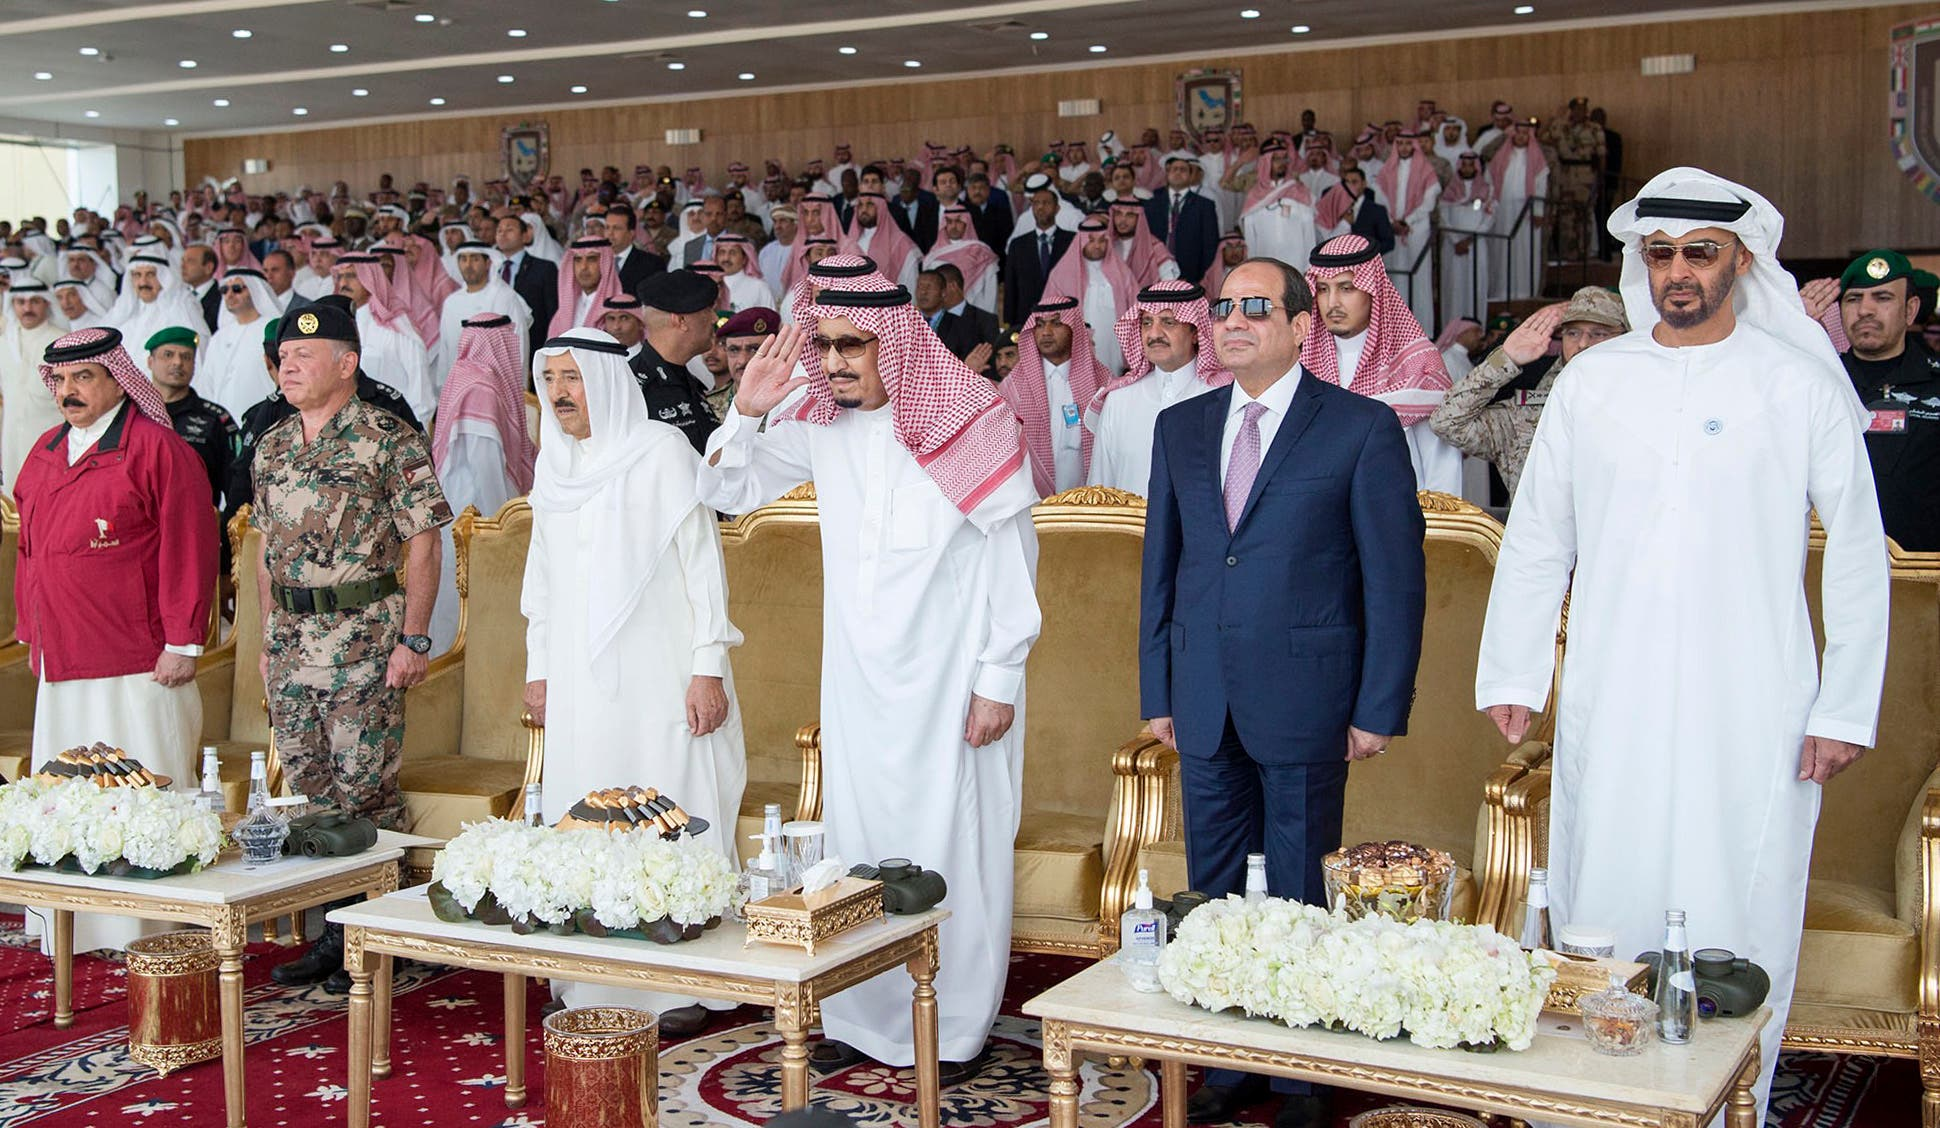 (L to R) Bahrain's King Hamad bin Isa Al Khalifa, Jordan's King Abdullah II, Kuwait's Emir Sheikh Sabah al-Ahmad al-Jaber al-Sabah, Saudi King Salman bin Abdulaziz, Egyptian President Abdelfattah al-Sisi, and Abu Dhabi Crown Prince Mohammed bin Zayed. (AFP)